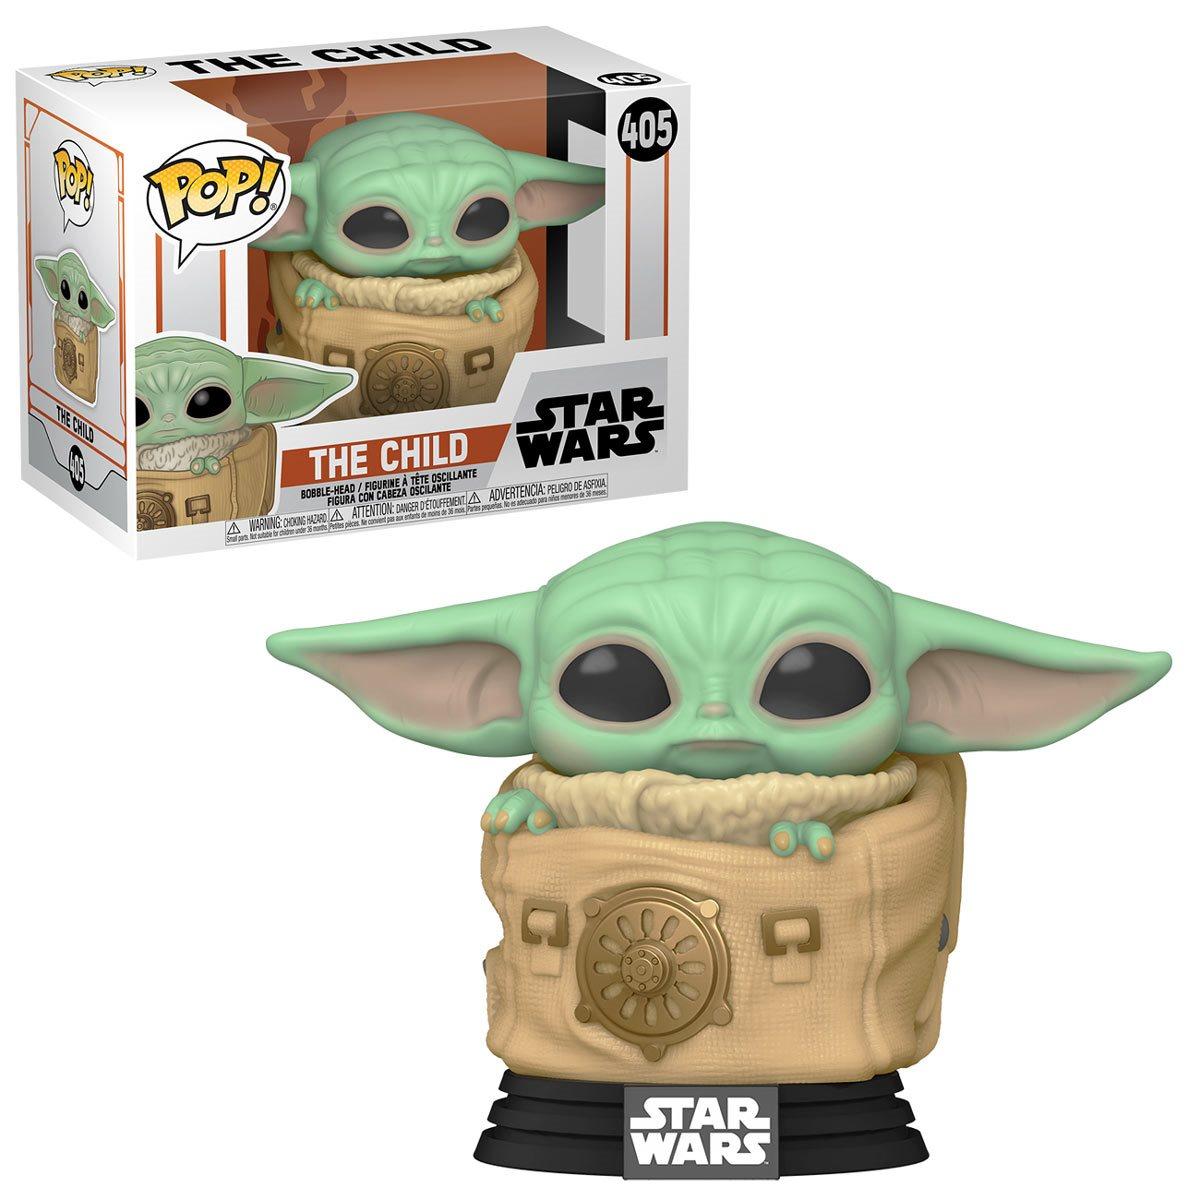 PRÉ VENDA: Funko Pop! Grogu ''Baby Yoda'' na Bolsa ( Child with Bag): The Mandalorian ( Star Wars )  #405 - Funko